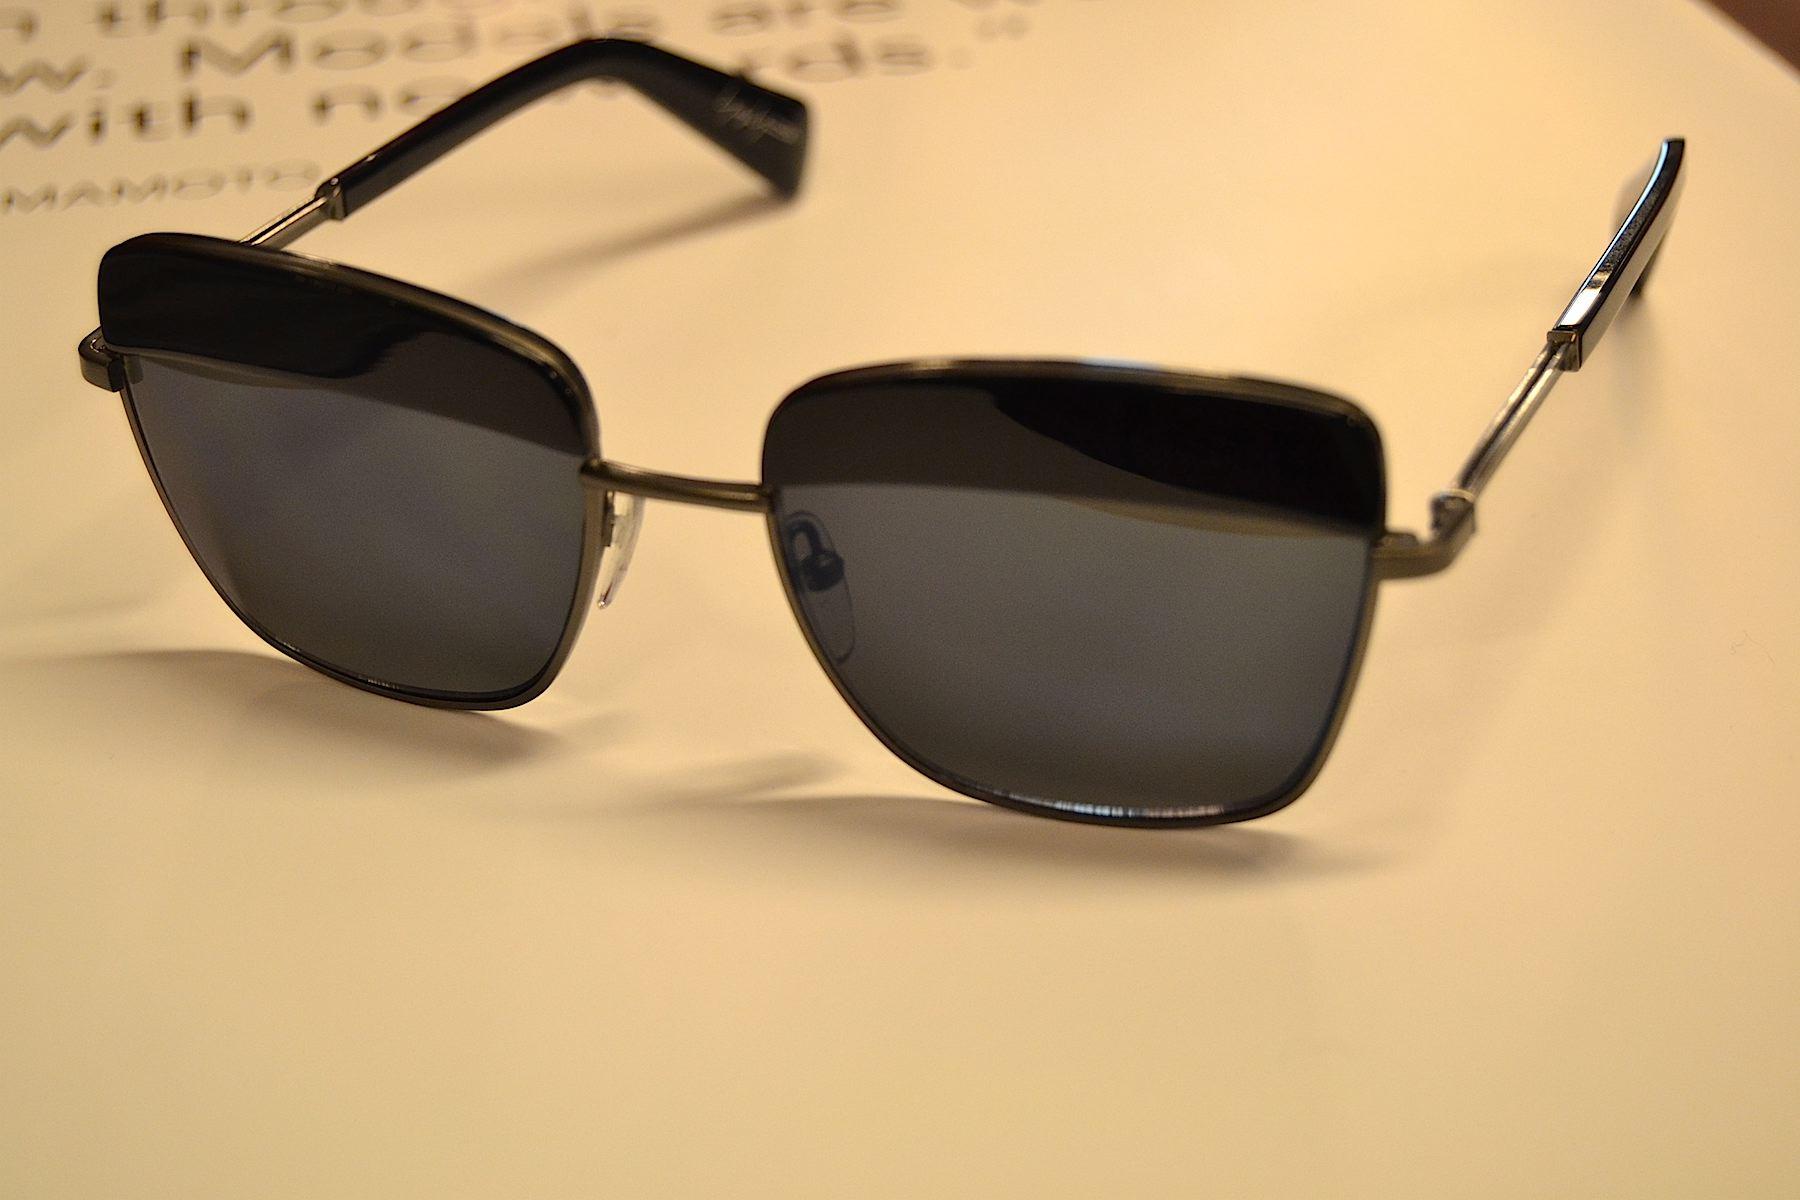 lenastore-bergamo-lenafashion-shop-online-yohji-yamamoto-gli-occhiali-sunglasses-2